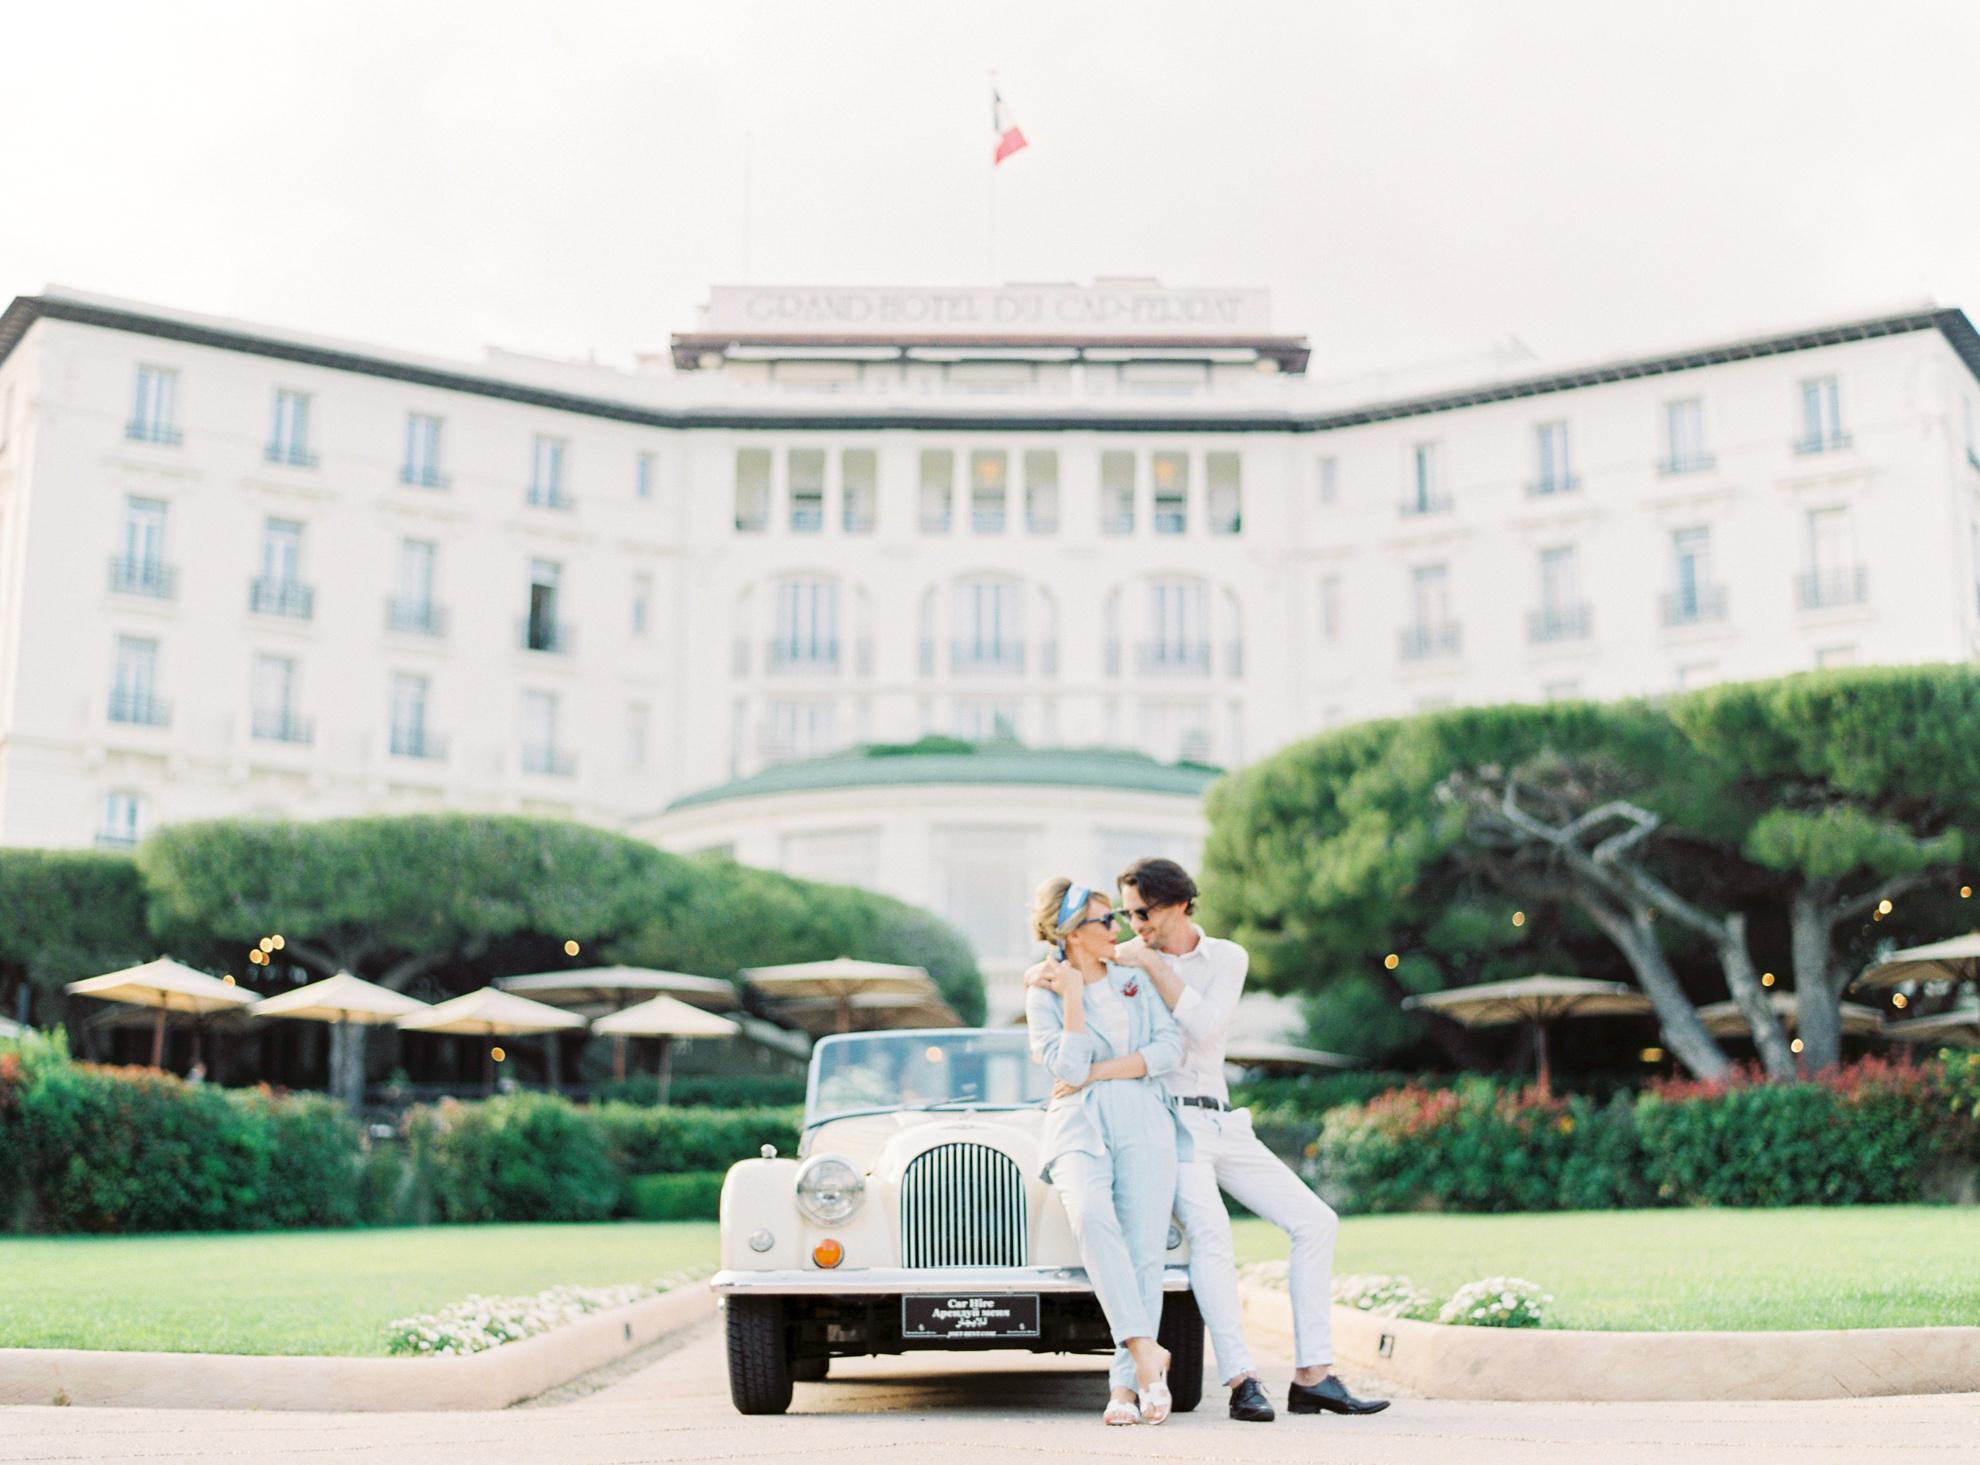 060 Grand Hotel du Cap Ferrat Fine Art Engagement Photography Session by Tony Gigov-2